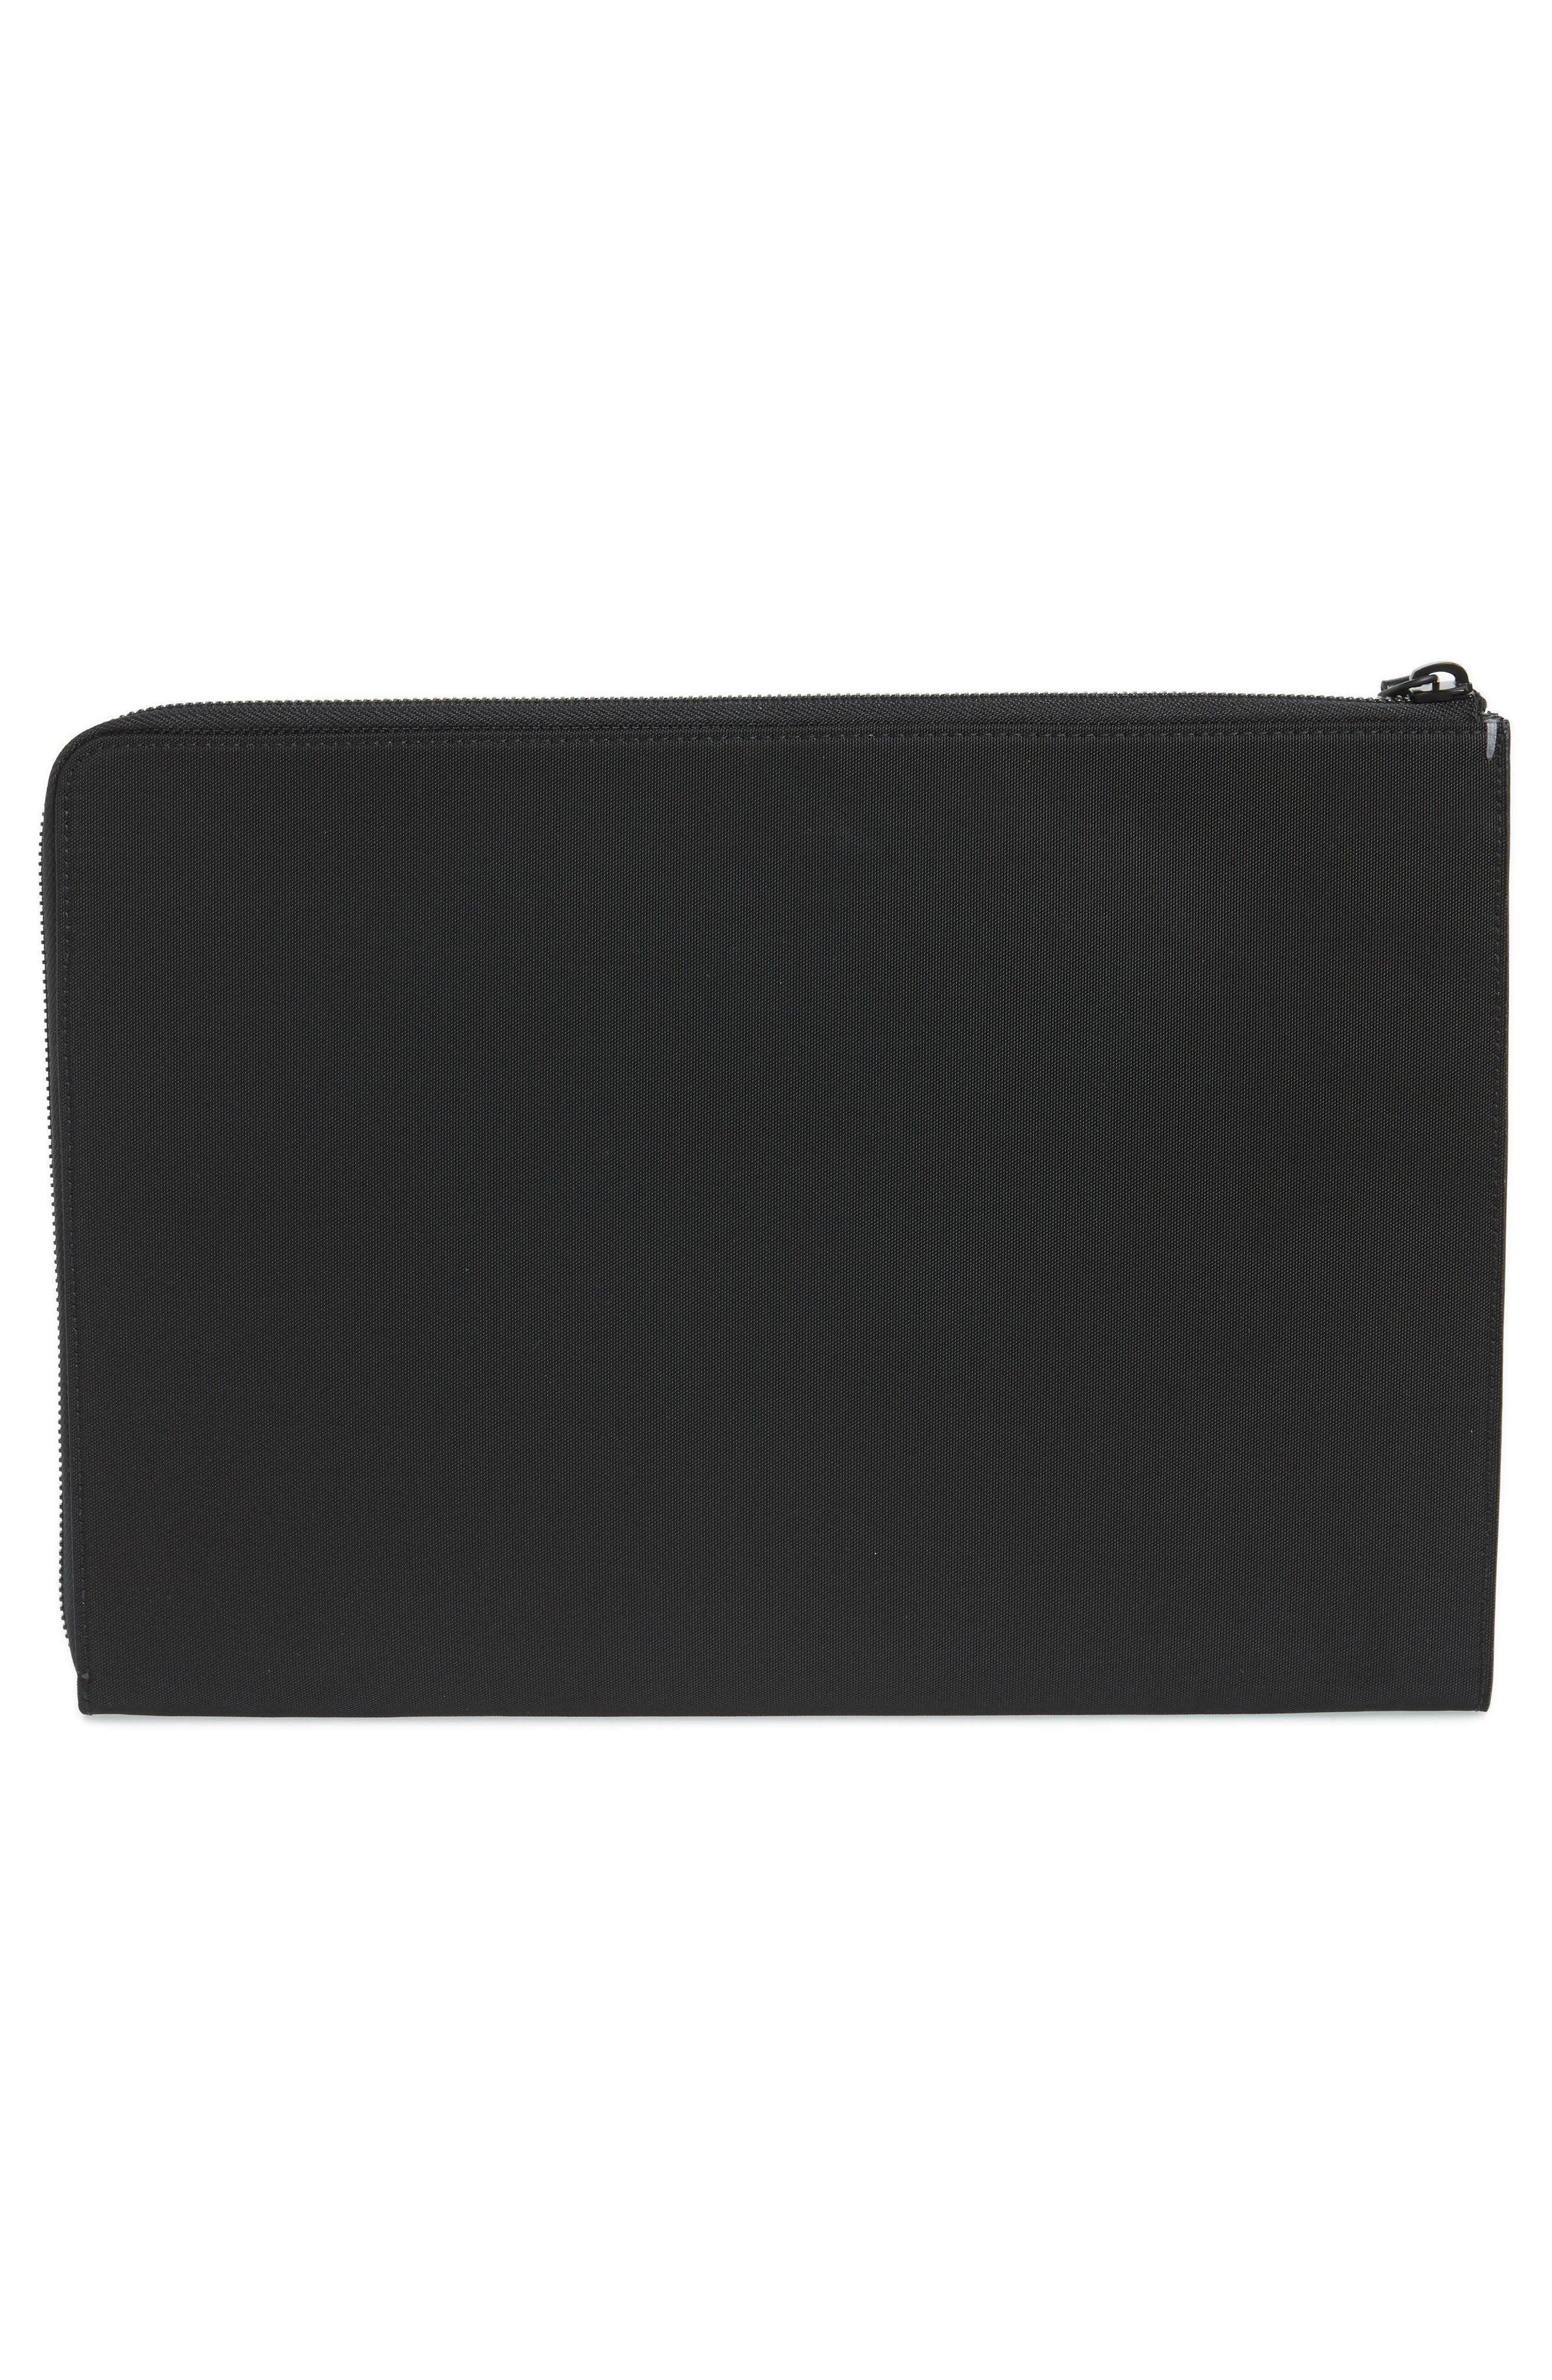 Portfolio Case,                             Alternate thumbnail 2, color,                             Black Nylon/ Black Leather